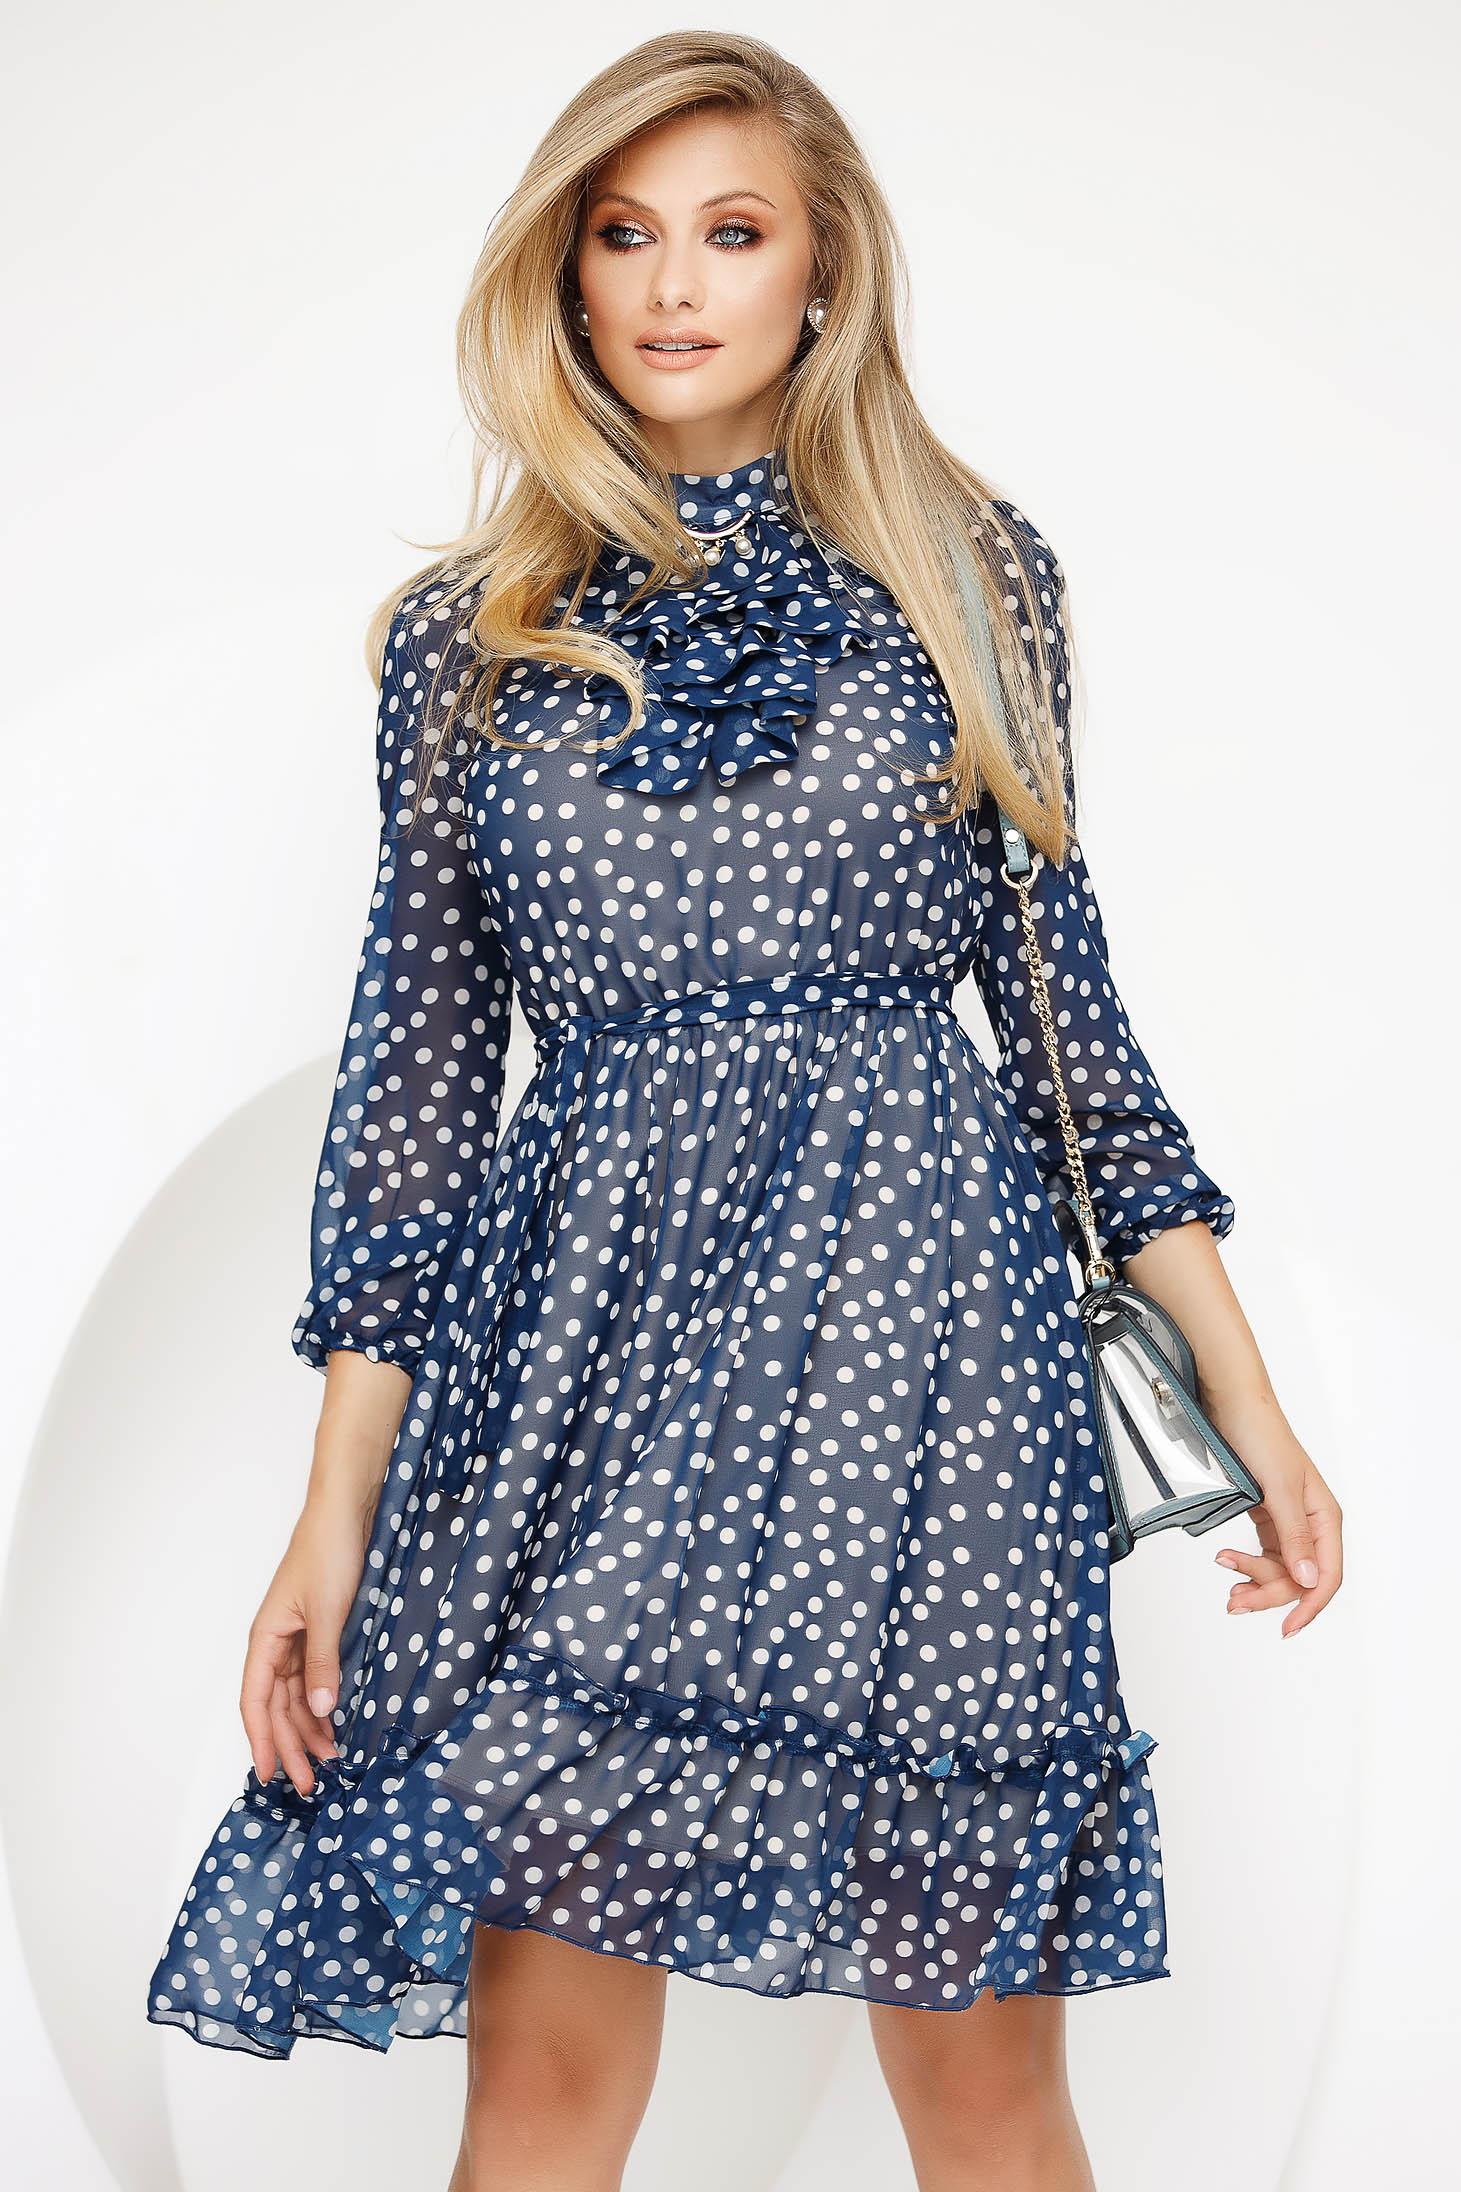 Elegant midi cloche blue dress from veil fabric dots print with inside lining